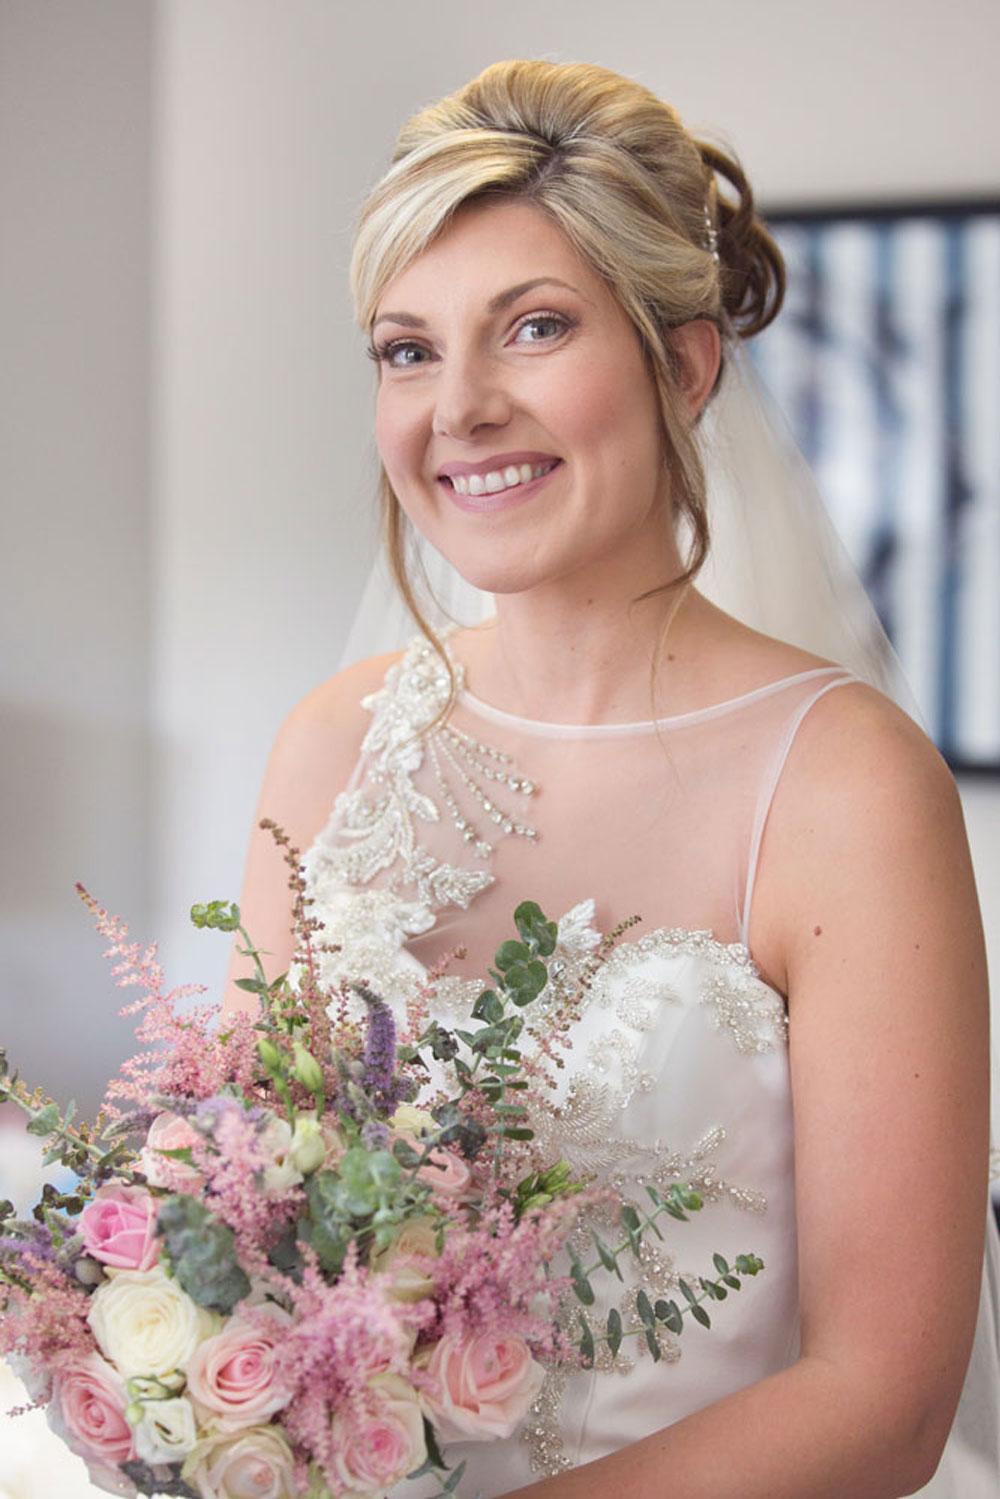 Ardoe House Hotel wedding, bride is holding the flowers, Anna Wytrazek Photography, wedding photographer Aberdeen